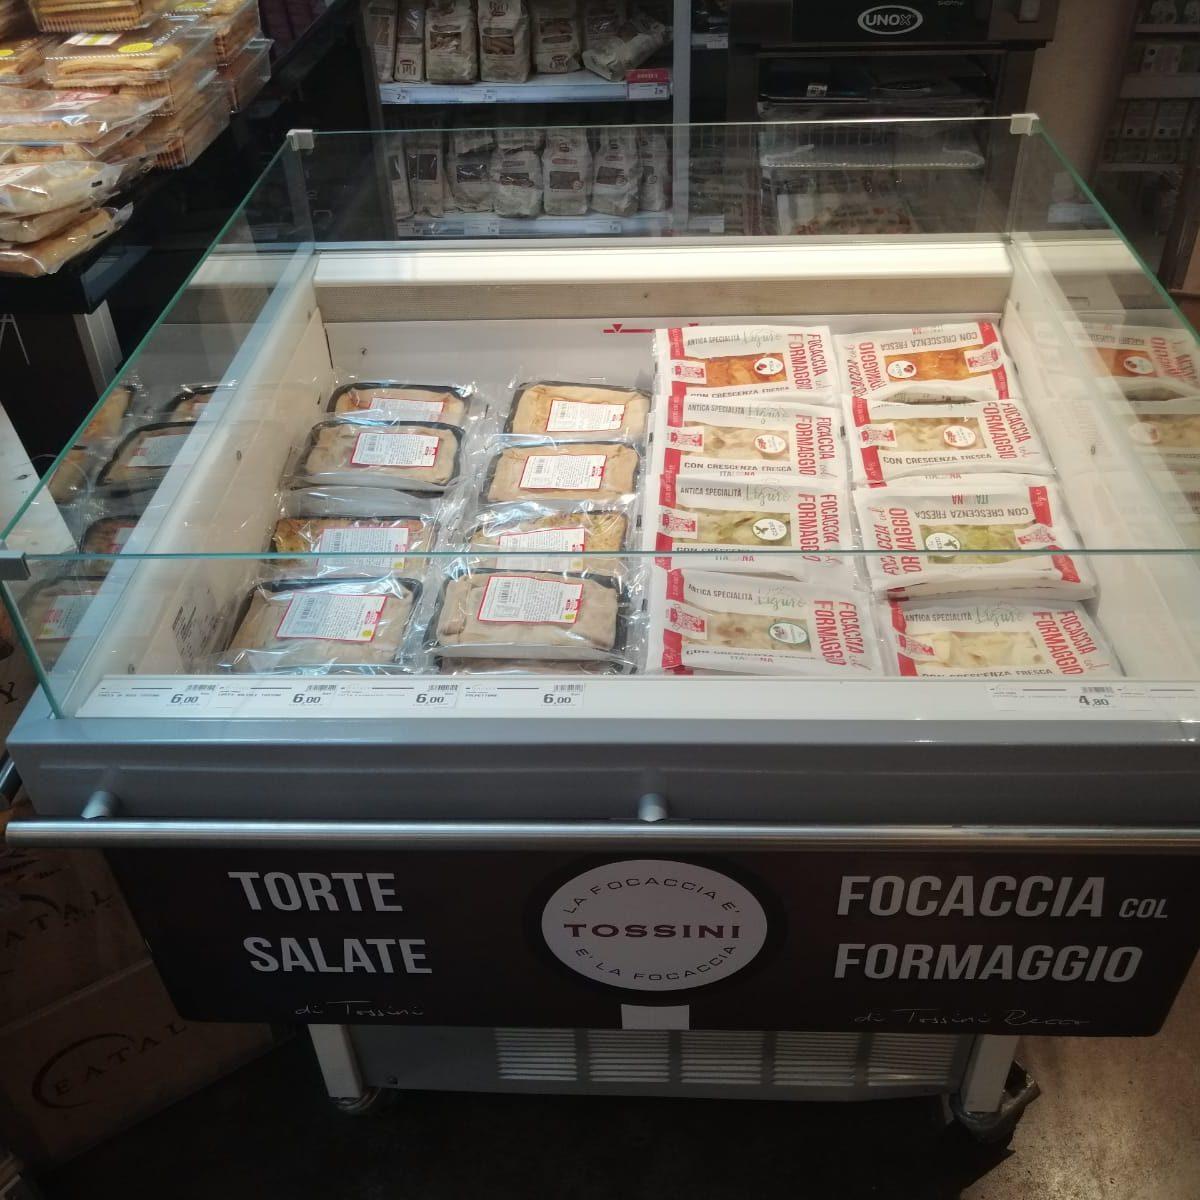 Corner Tossini -Eataly Store Milano Smeraldo (8)